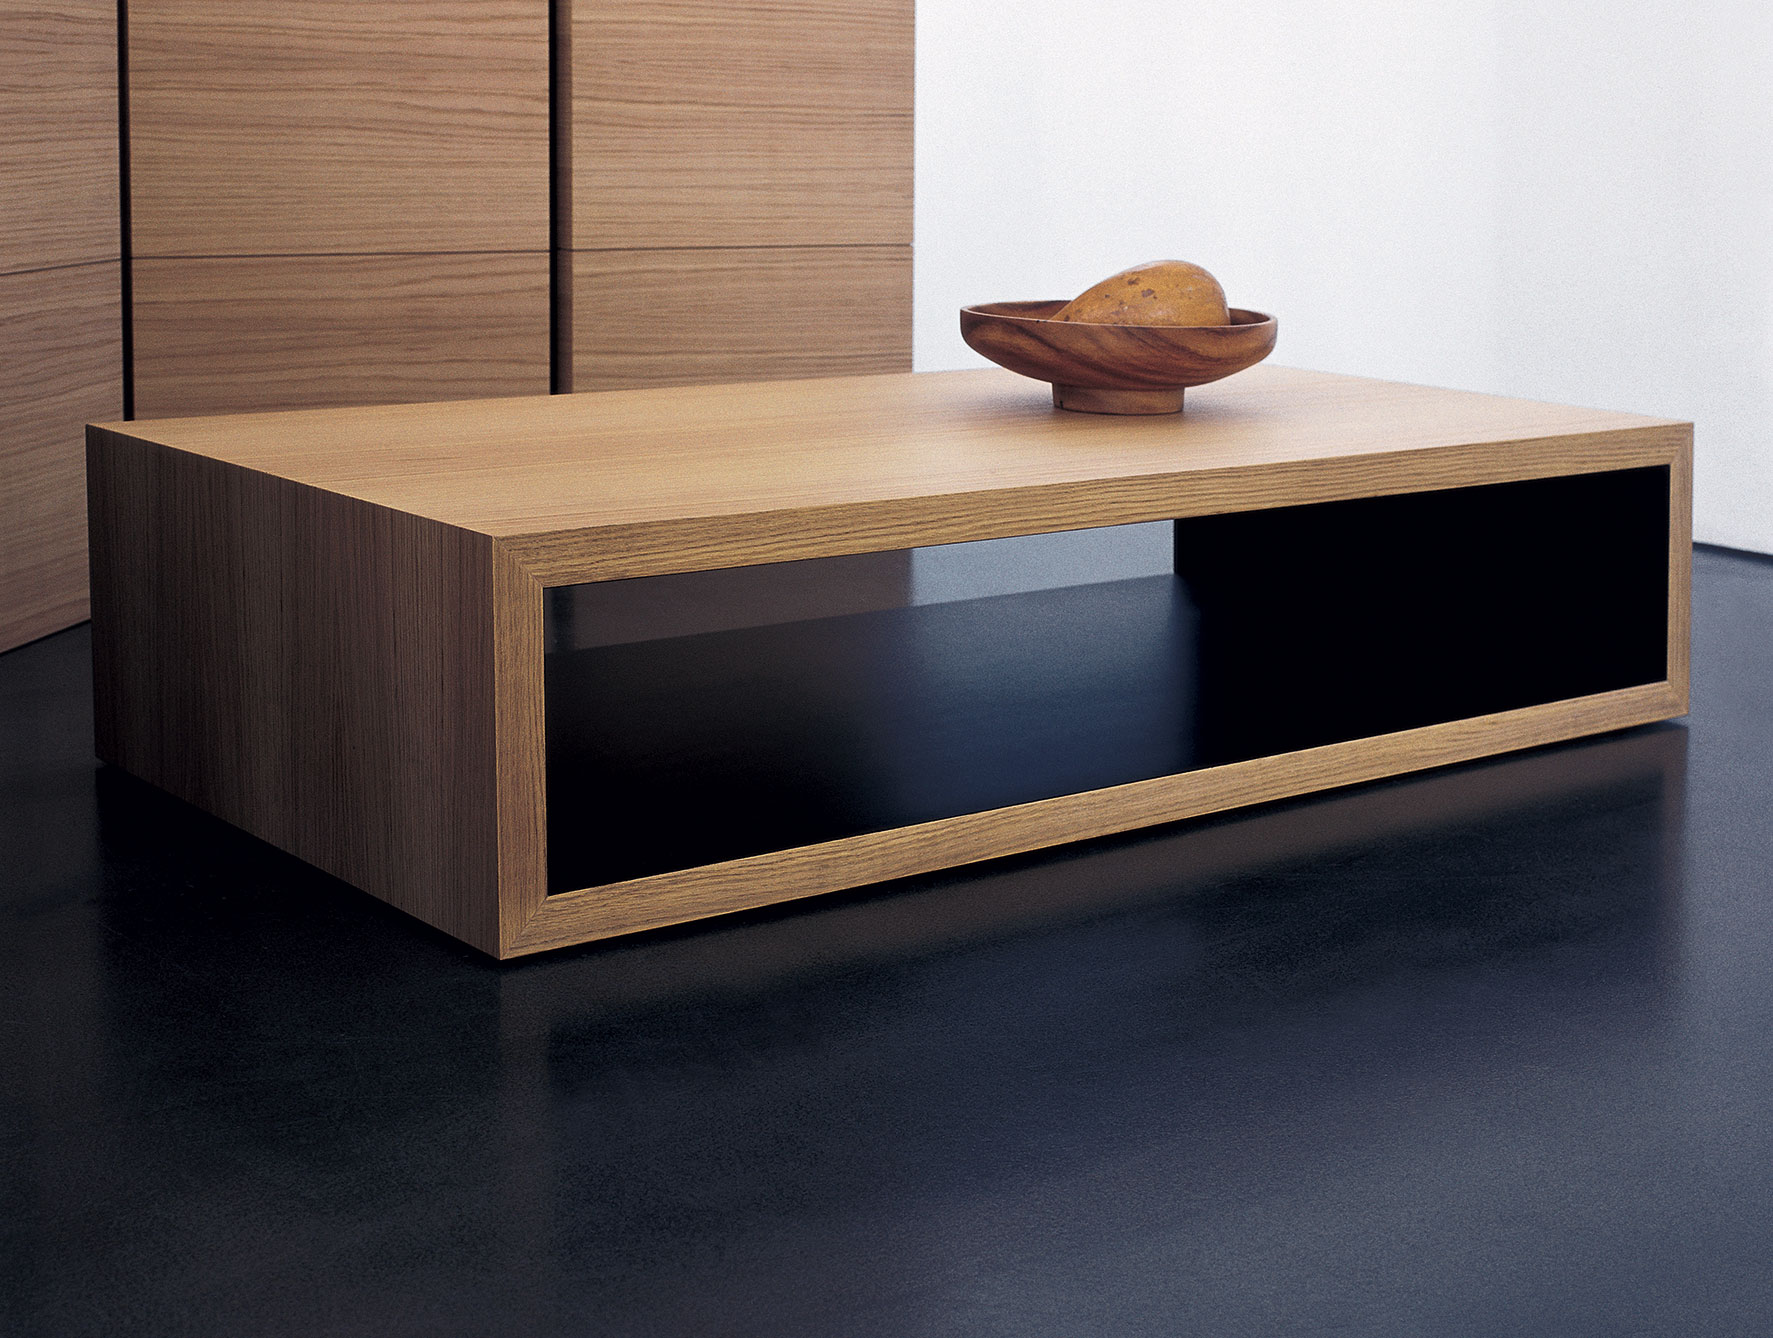 Modern-wood-coffee-table-reclaimed-metal-mid-century-round-natural-diy-All-modern-walnut-coffee-table-mondo (Image 9 of 10)